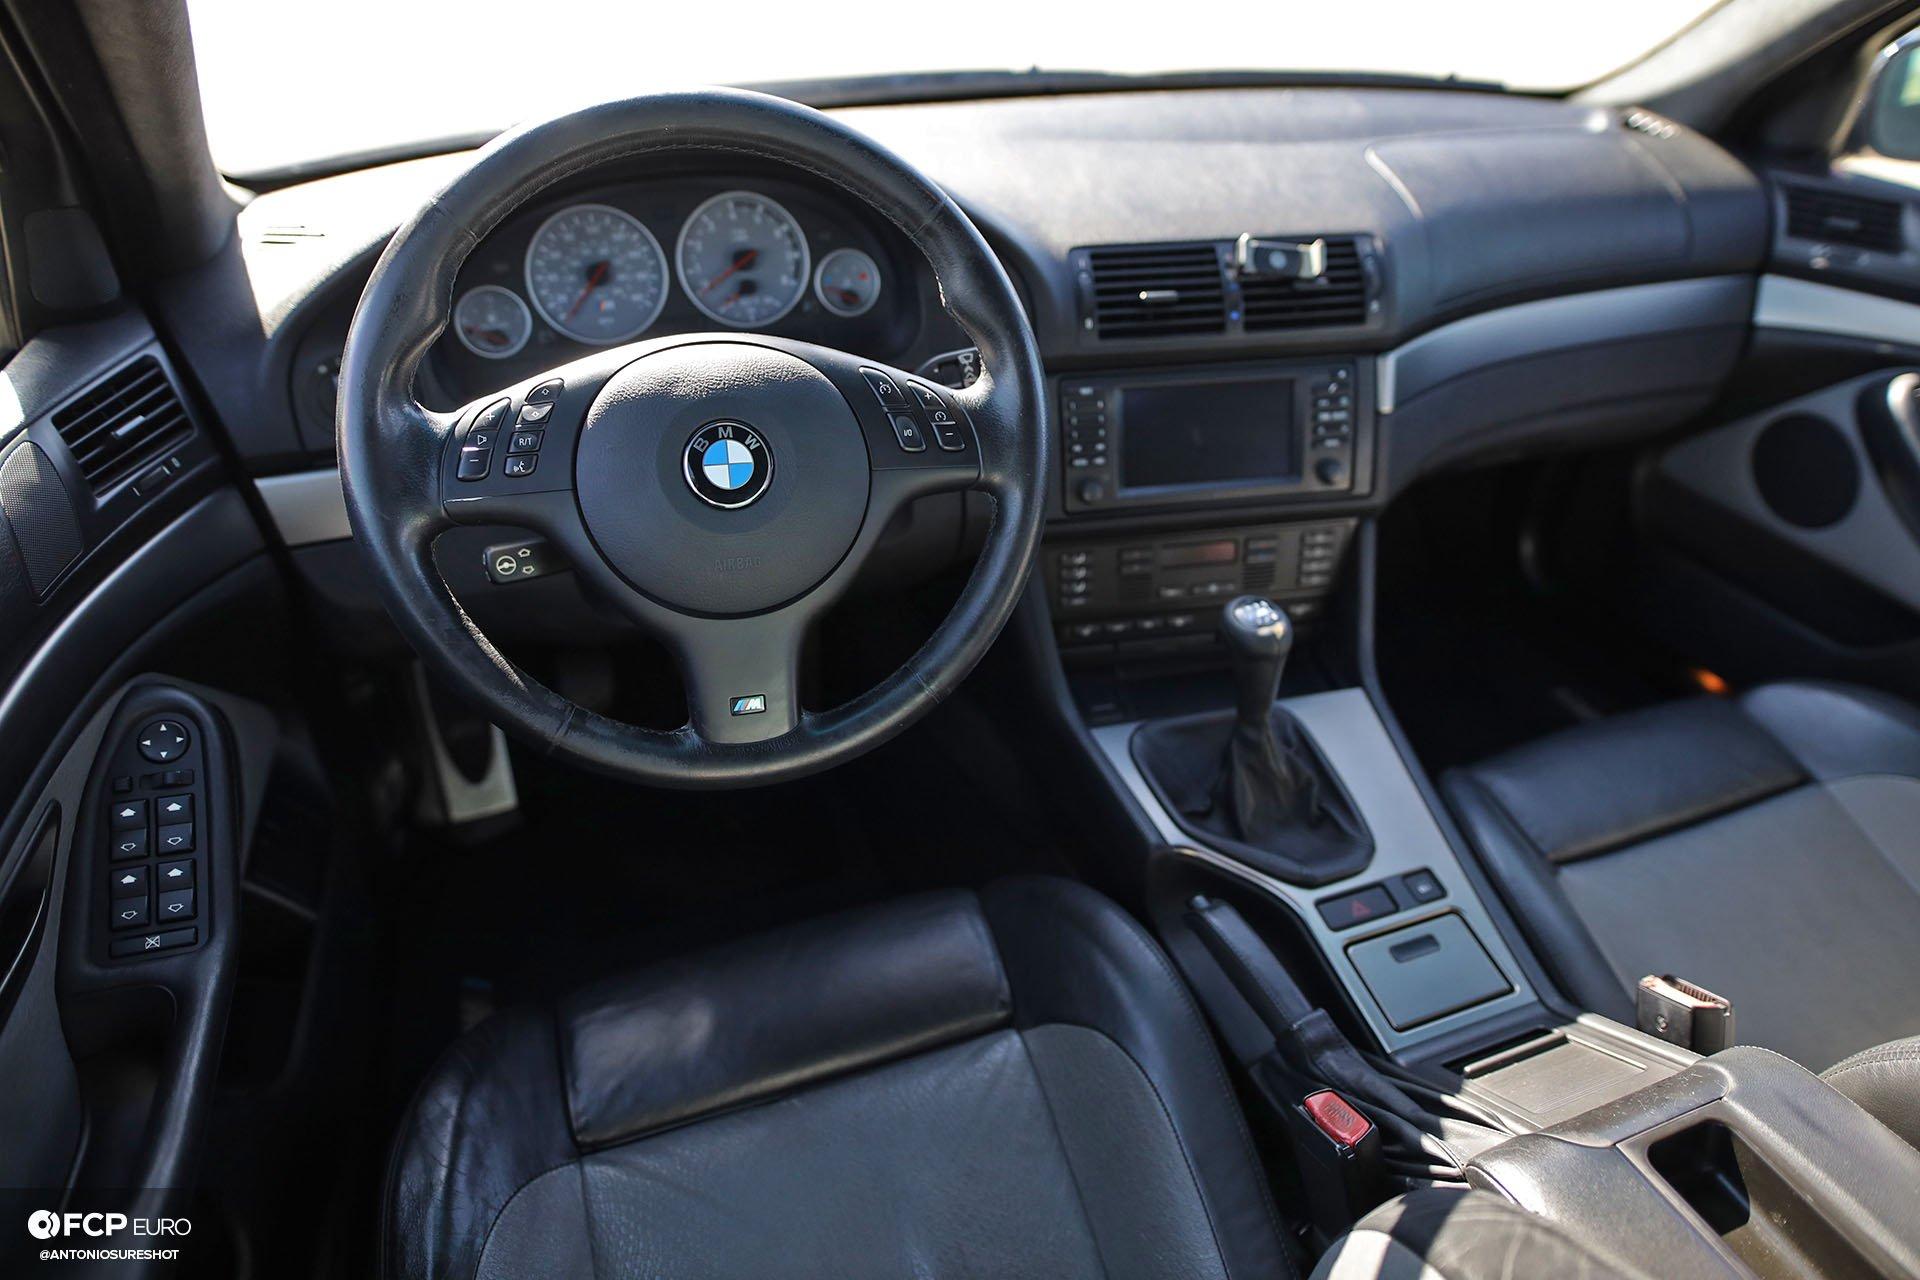 E39 BMW M5 S62 MotoIQ Advan Wheels KW Suspension Stoptech